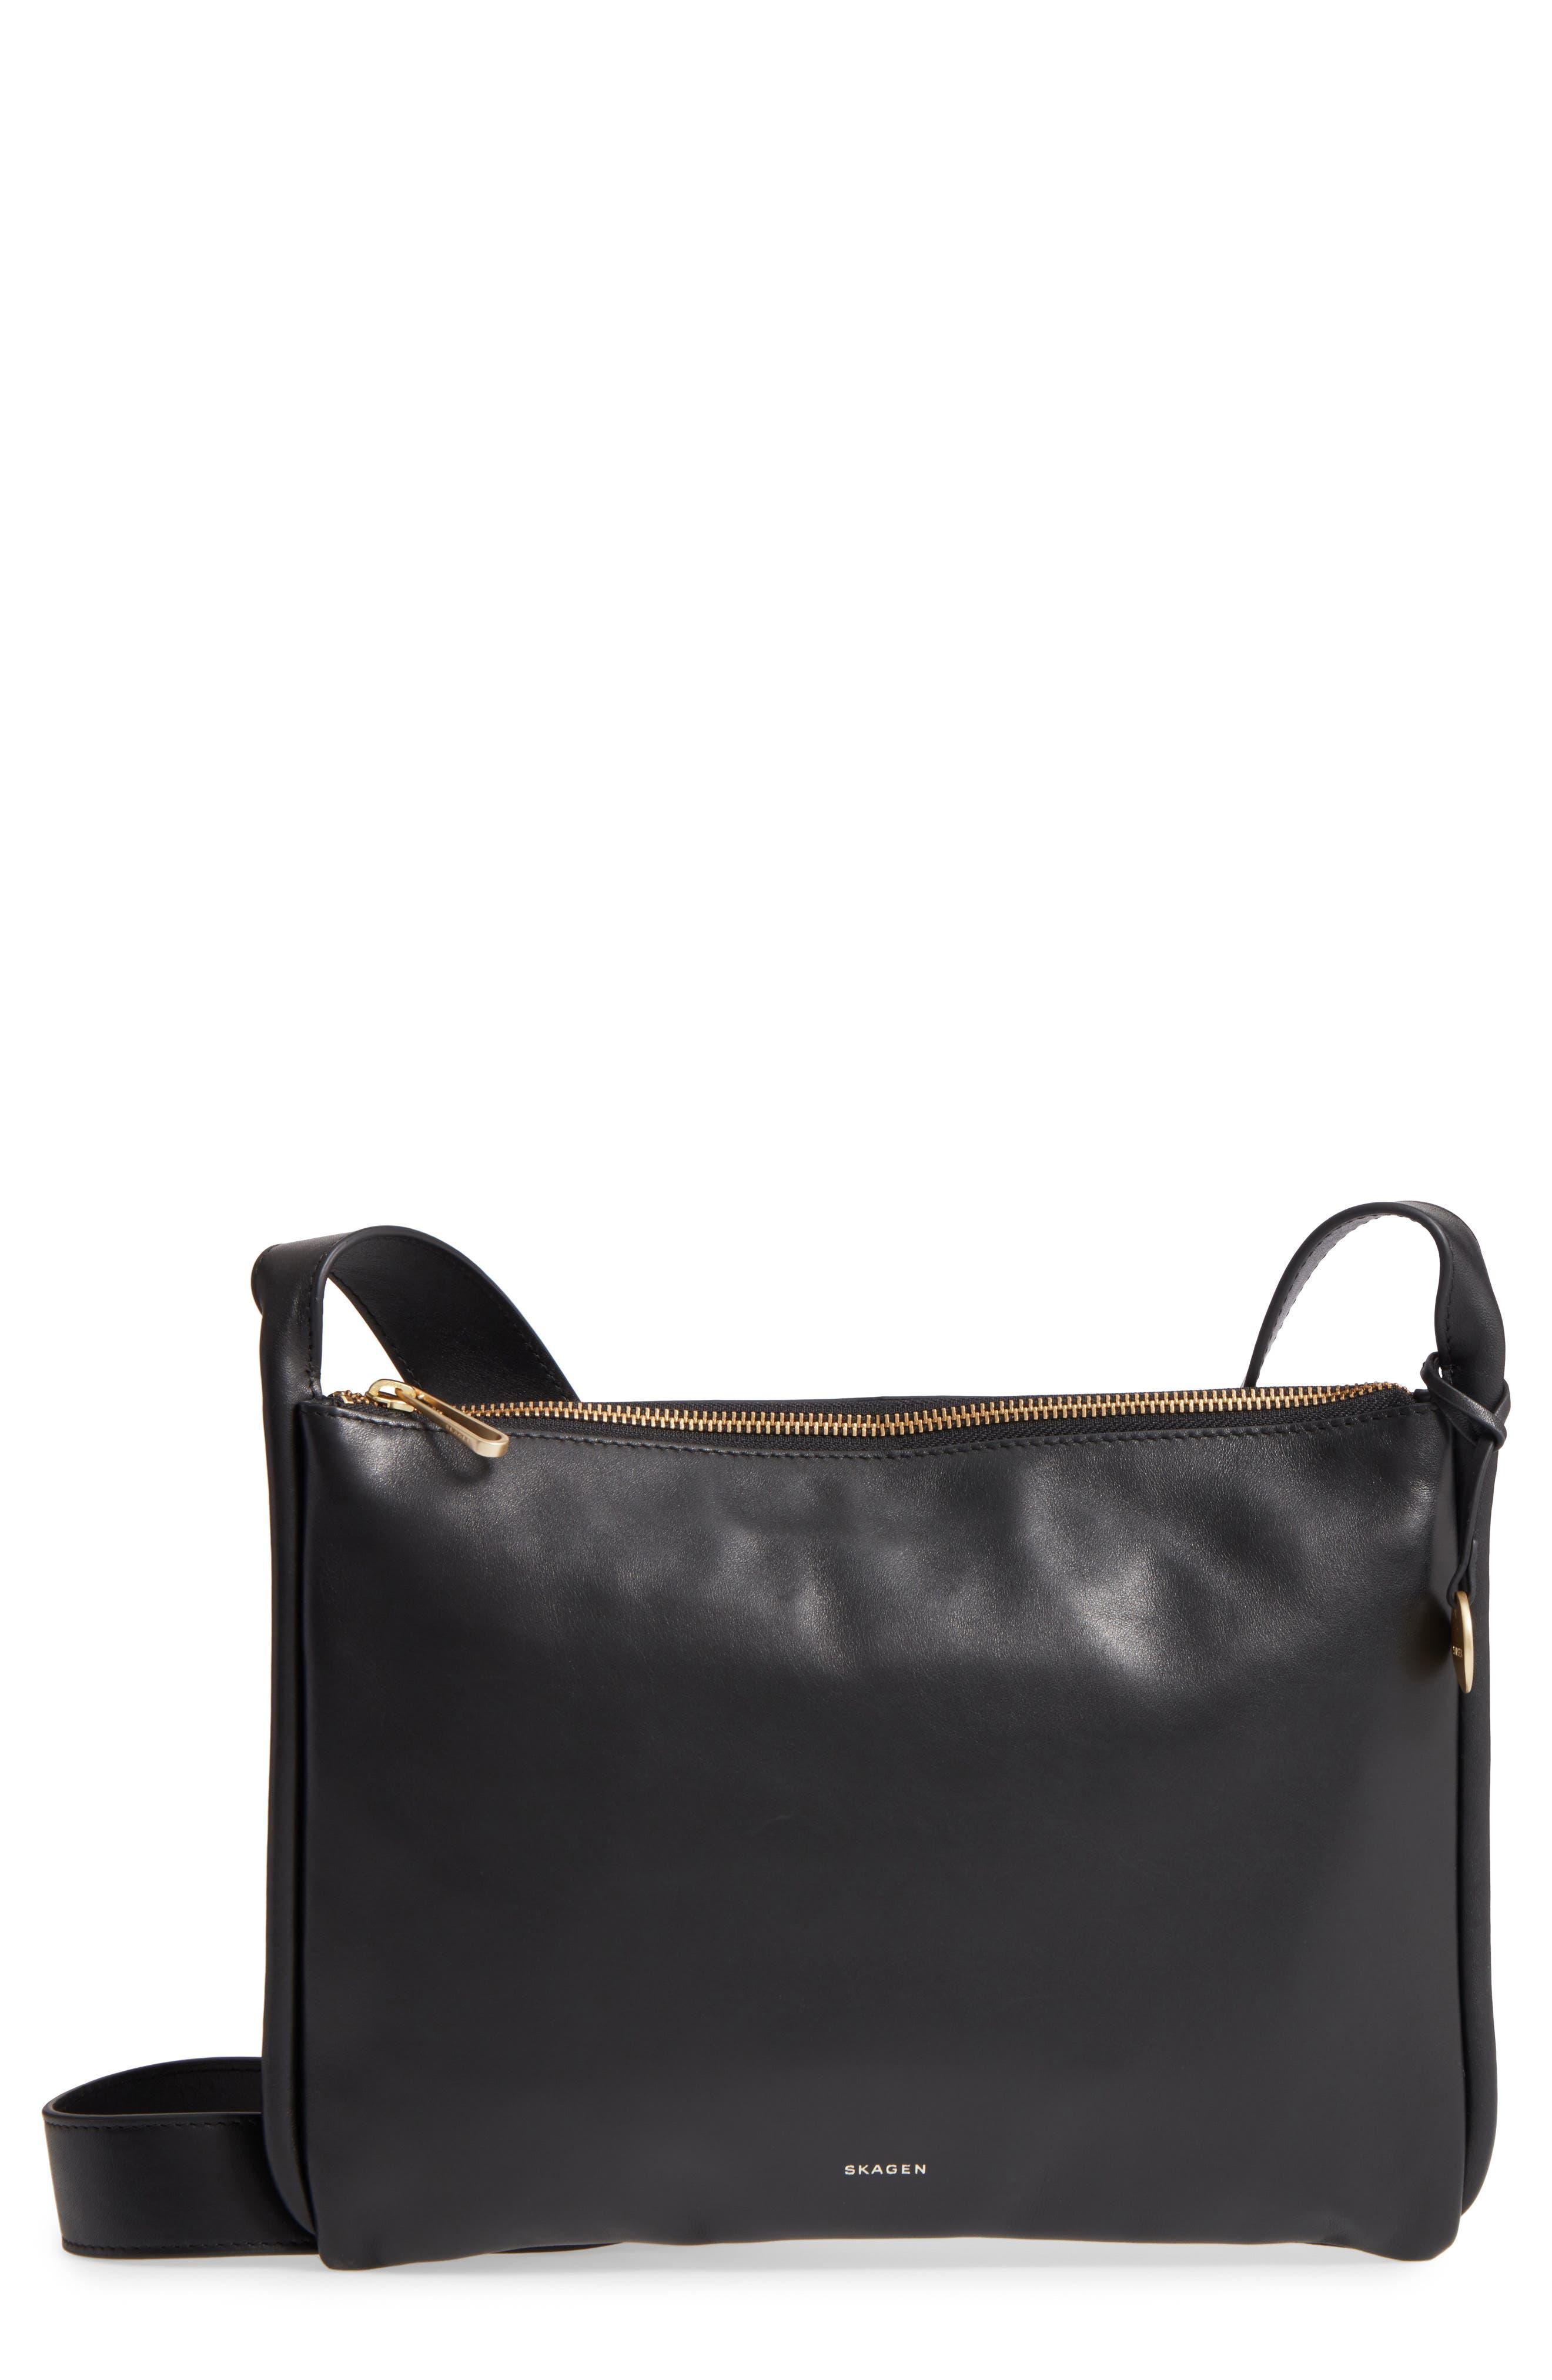 Main Image - Skagen Slim Anesa Leather Crossbody Bag